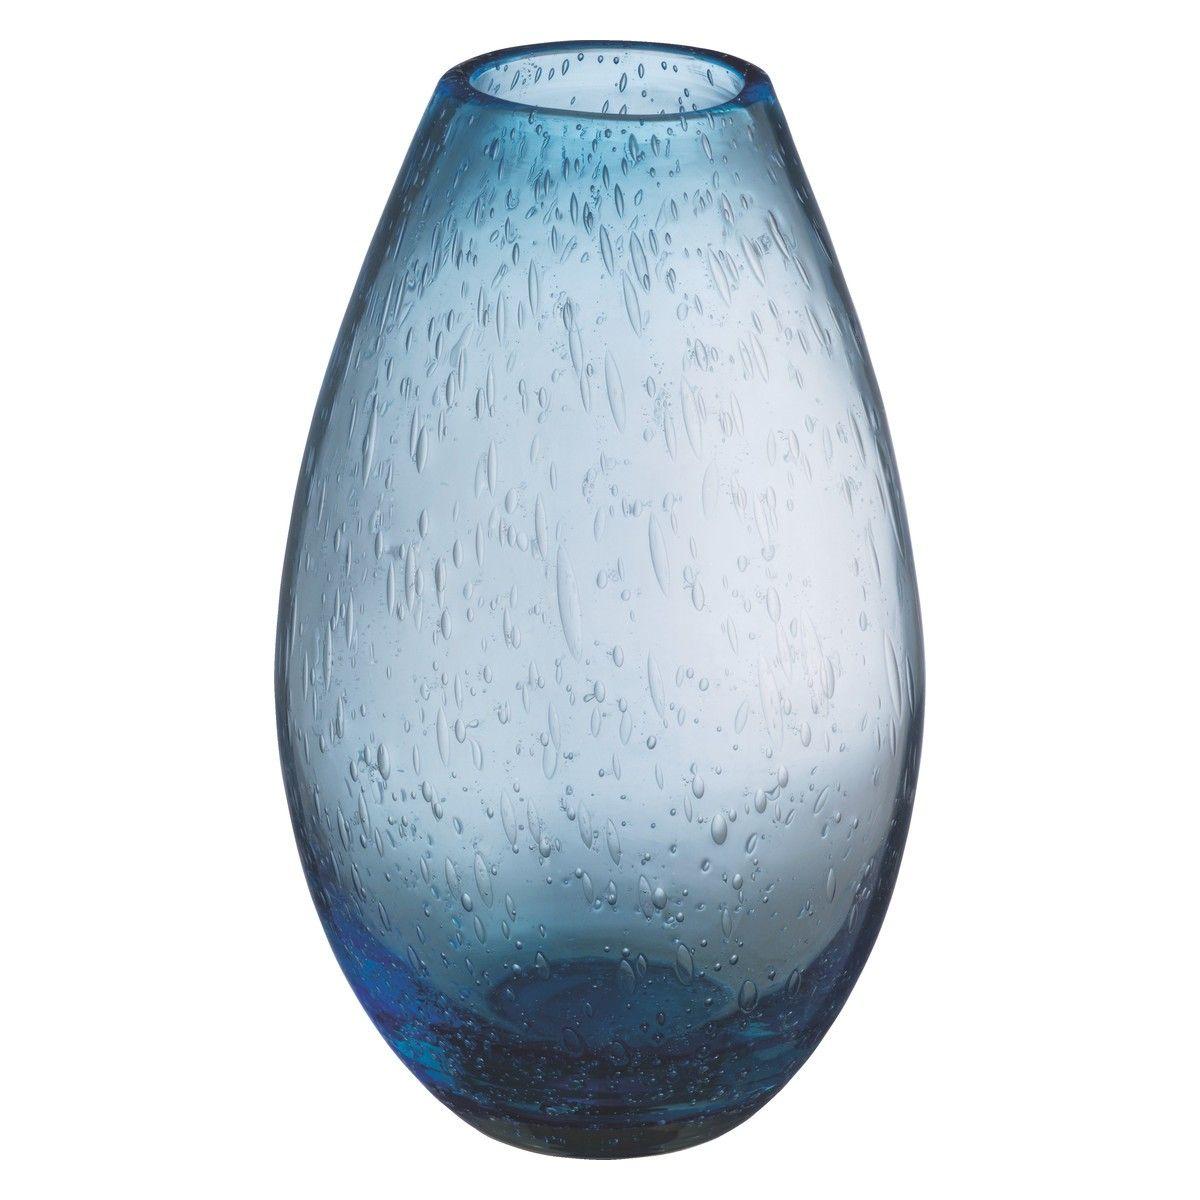 Bubble Blue Bubbled Glass Vase Buy Now At Habitat Uk Blue